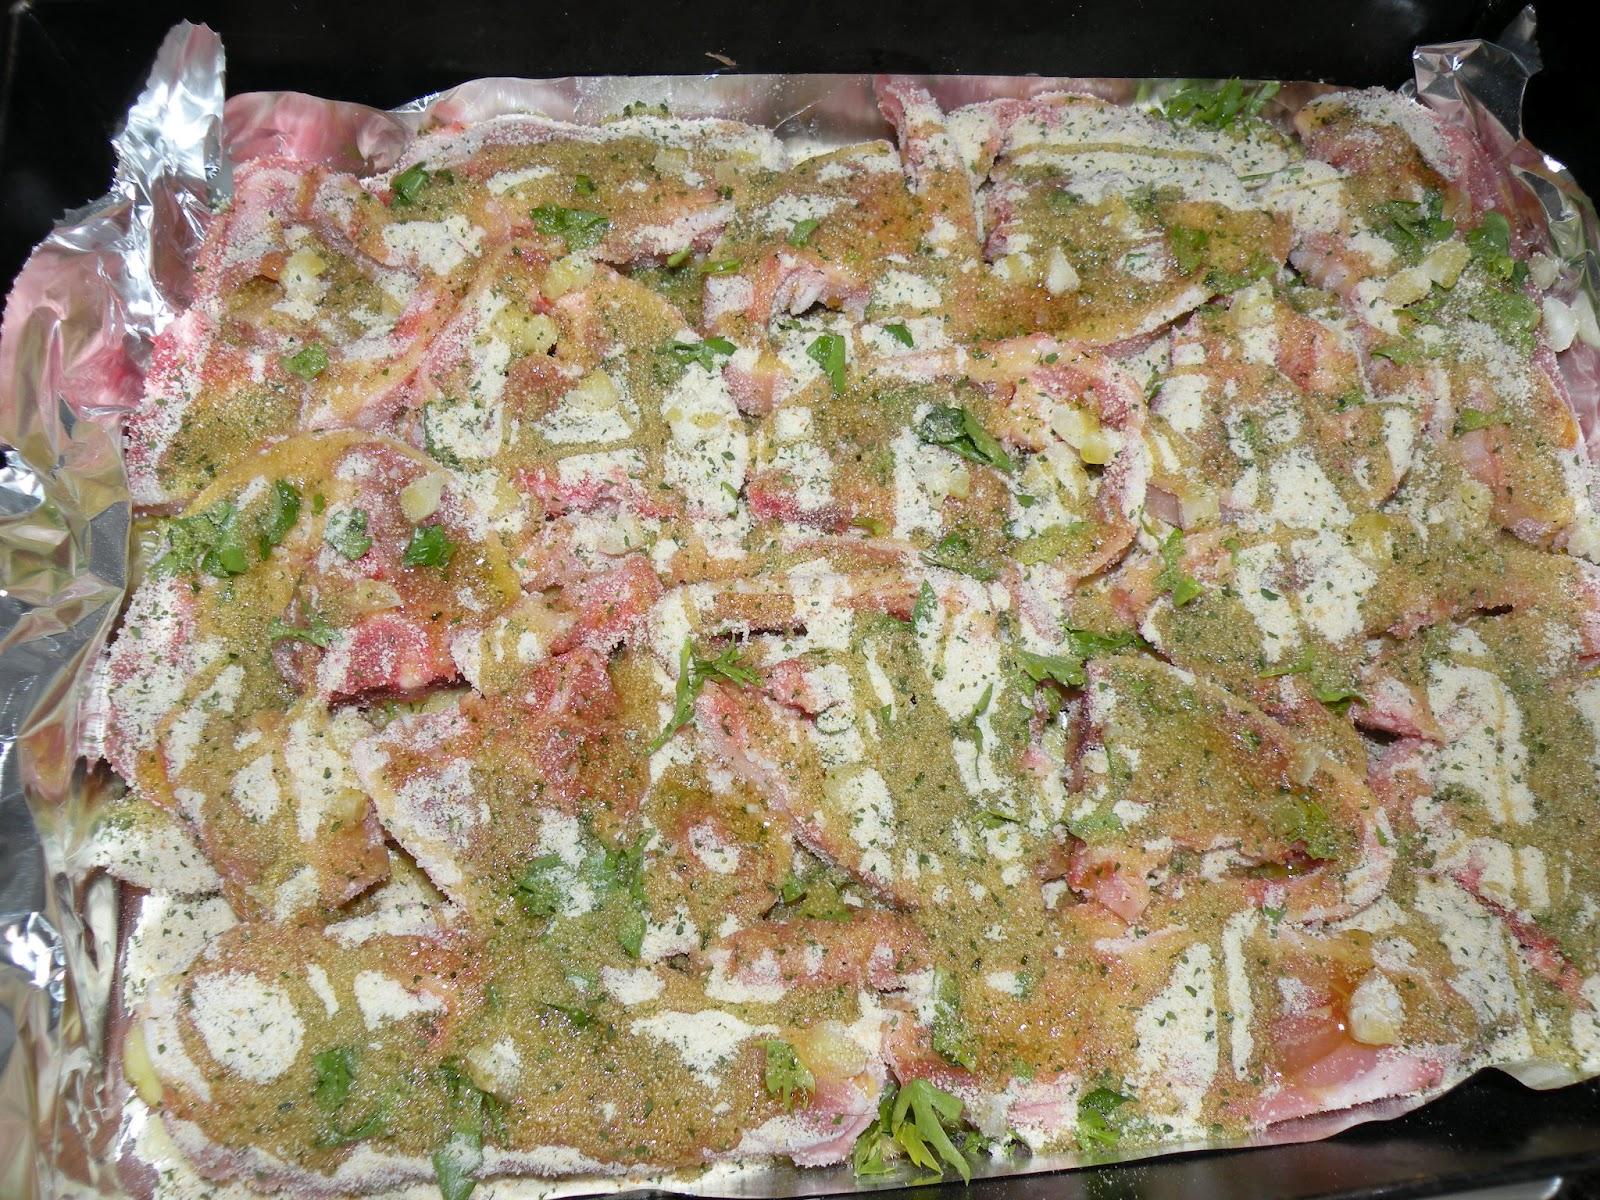 Vitat que est bo chuletillas de cordero al horno - Chuletas de cordero al horno con patatas ...